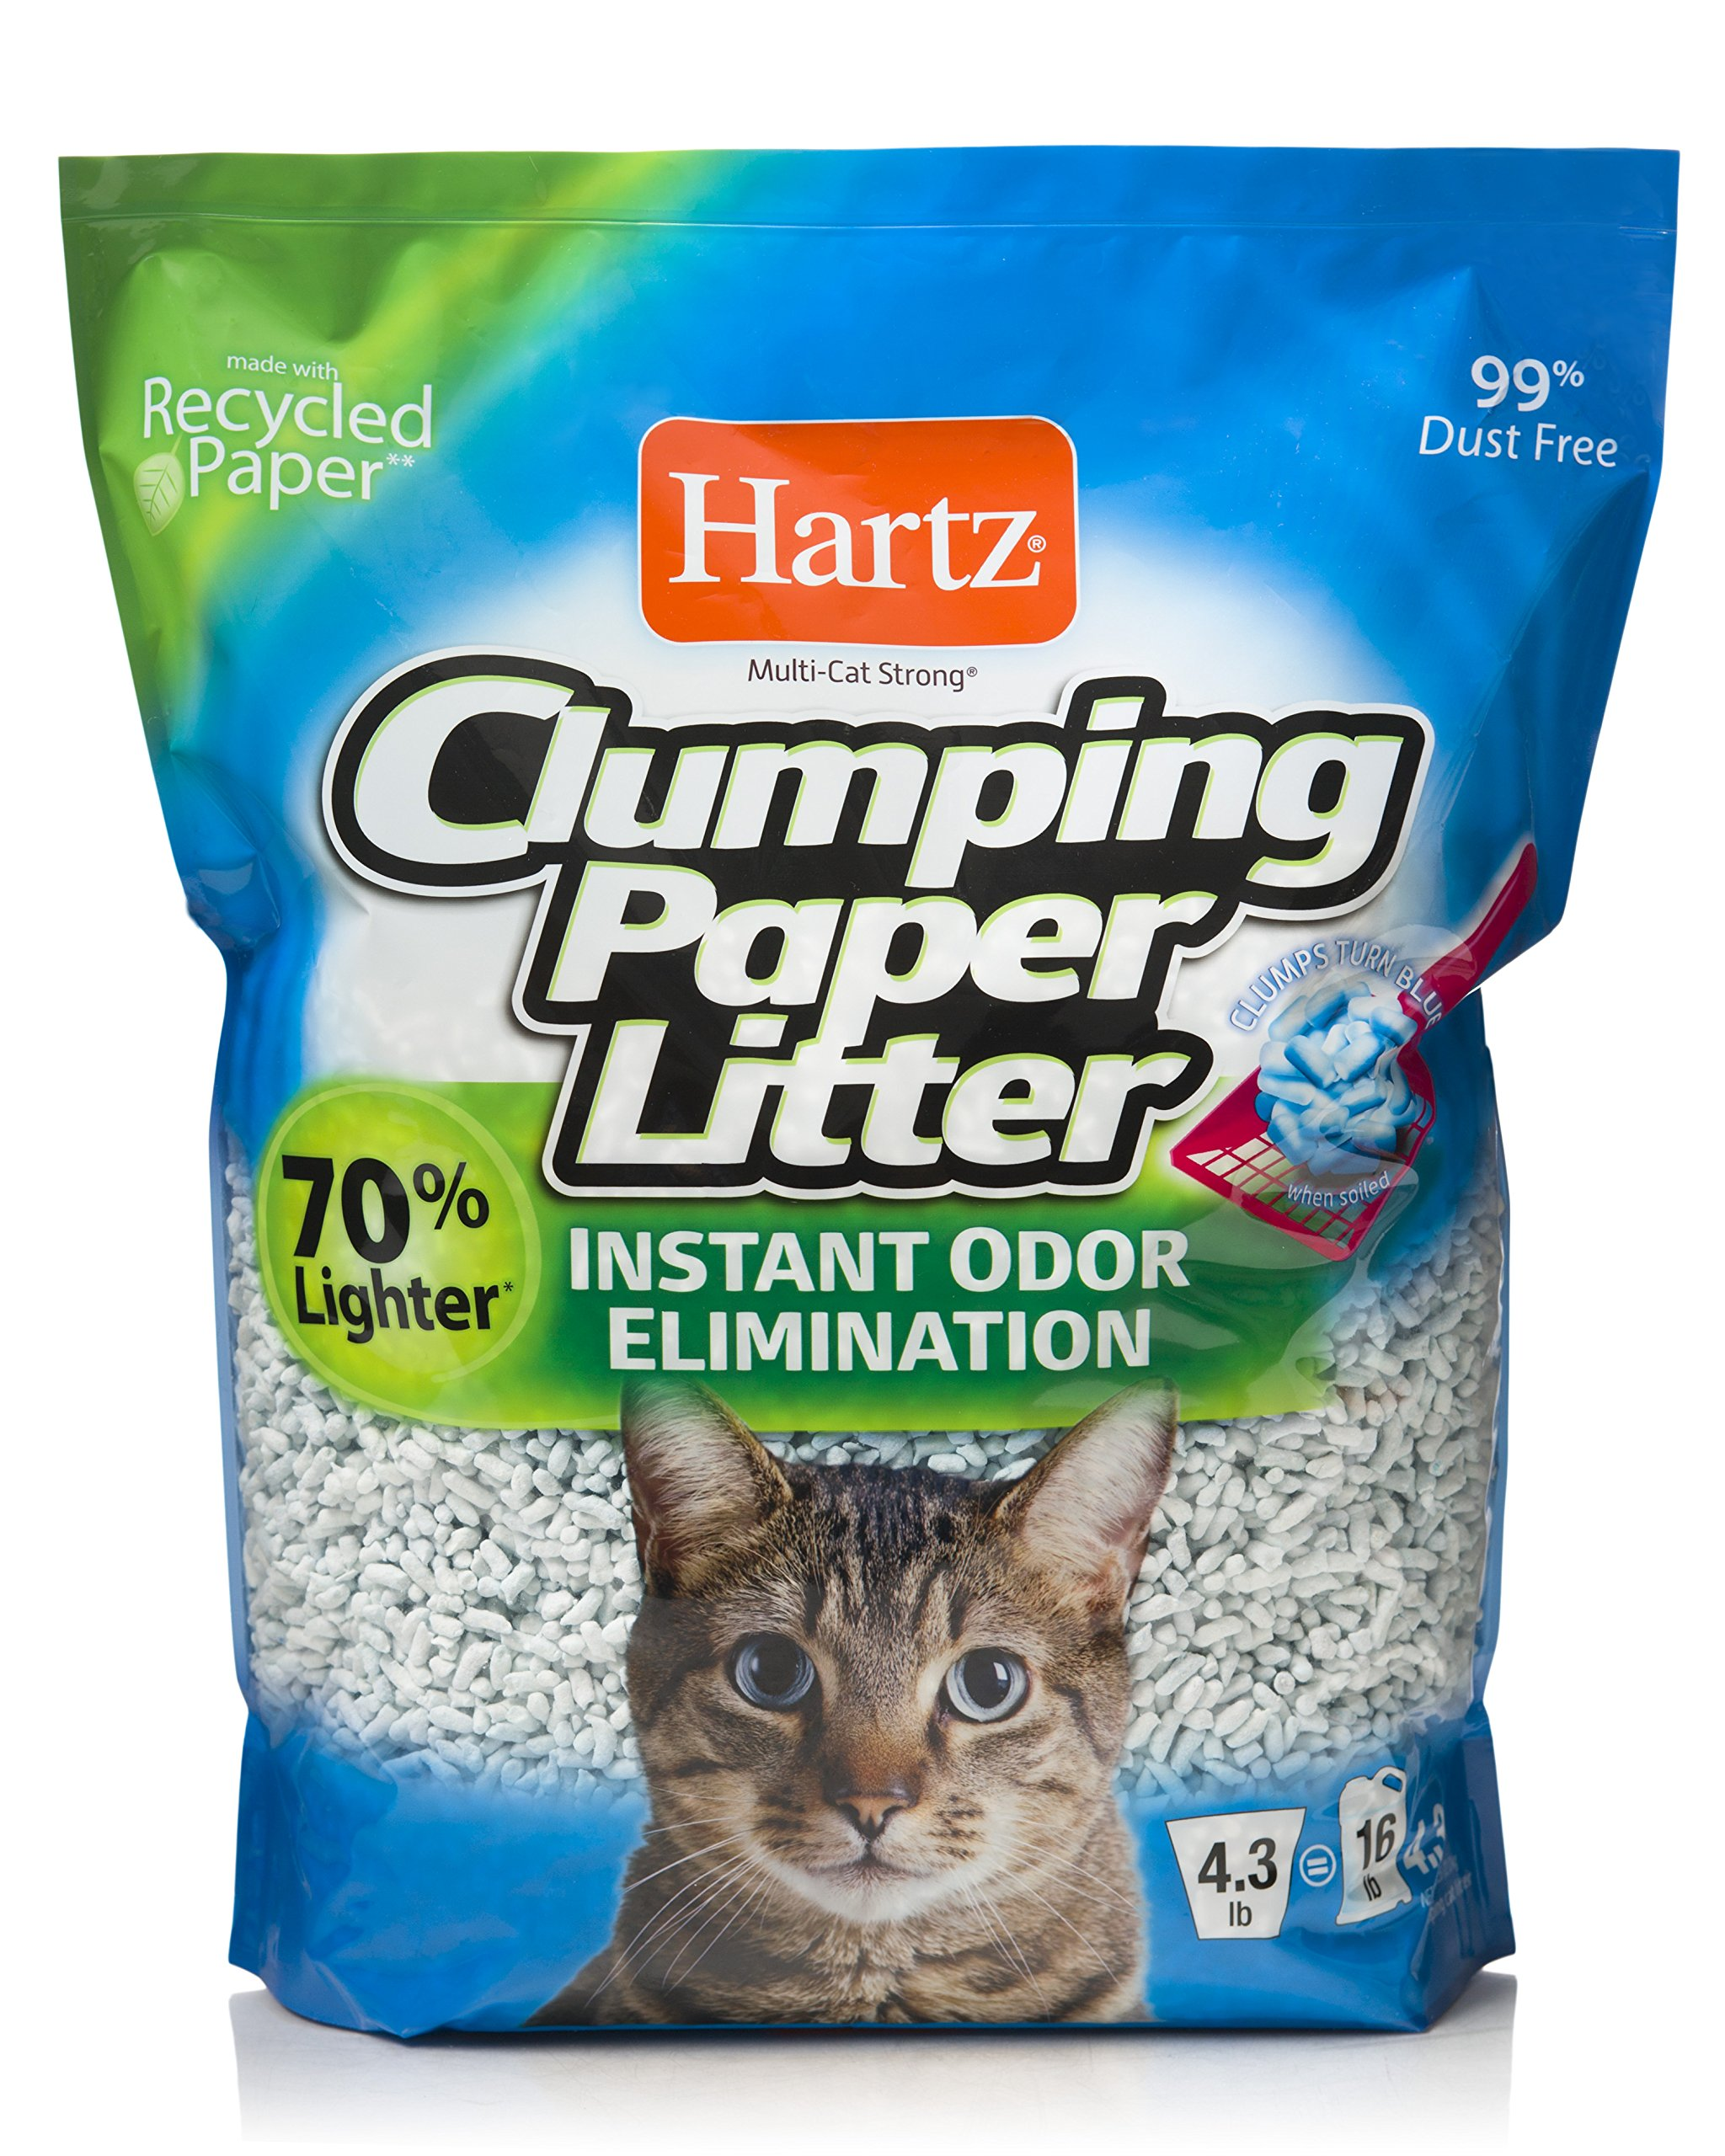 ..HARTZ Multi-Cat Lightweight Recycled Clumping Paper Cat Litter - 4.3lb